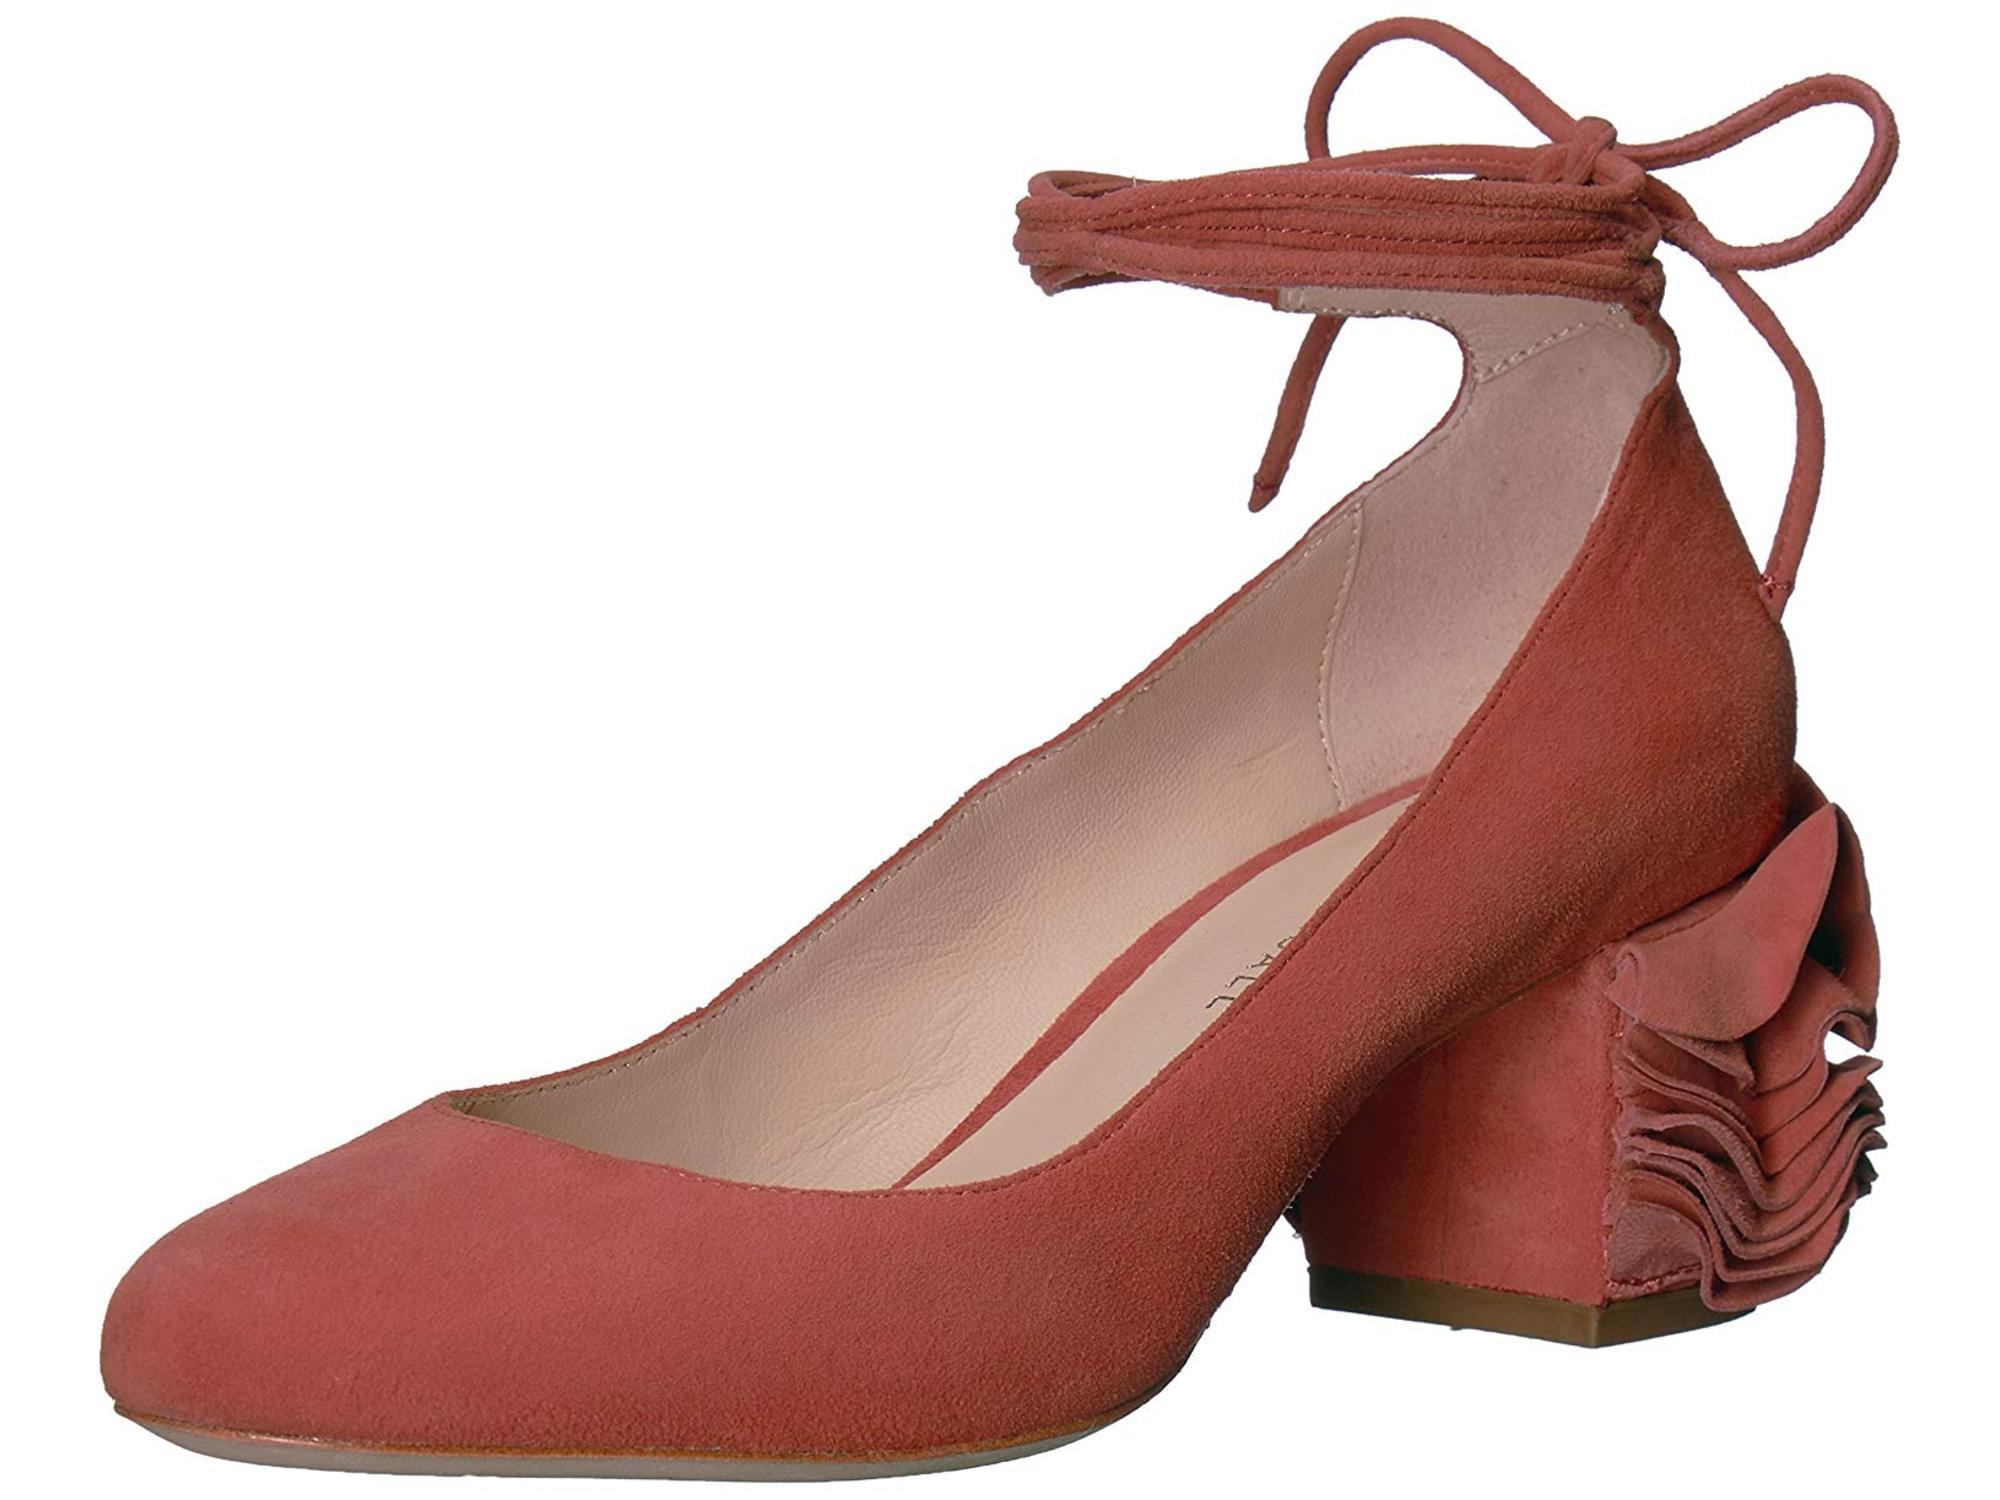 3a02b4a91f1 Loeffler Randall Clea Low-Heel Ankle Strap Pumps